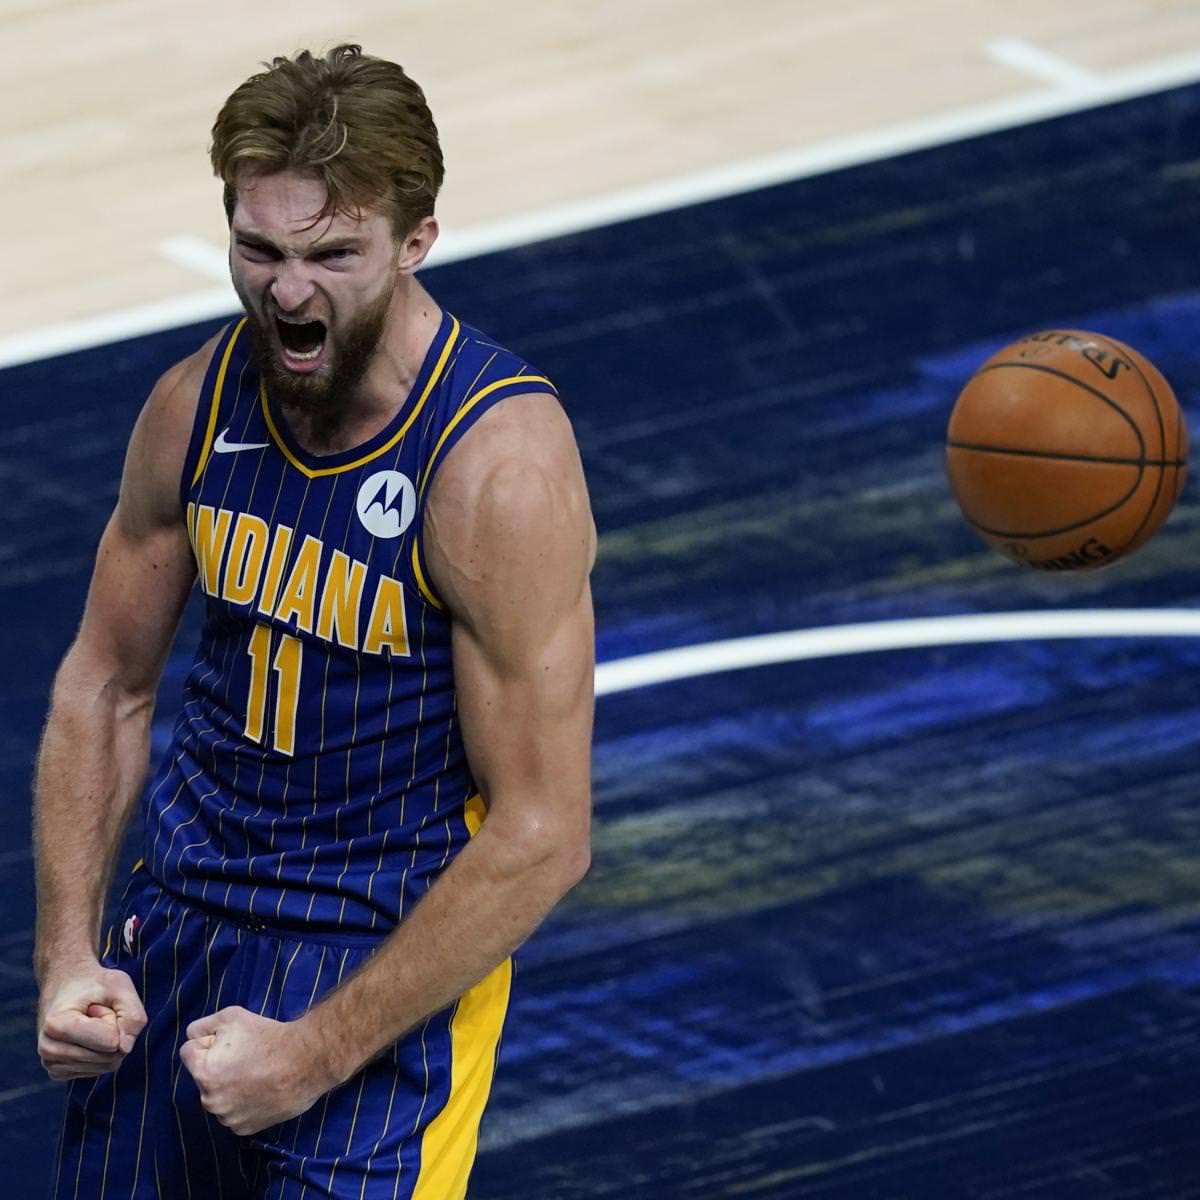 Conselhos para StatHero NBA Team Survivor Picks para 14 de janeiro